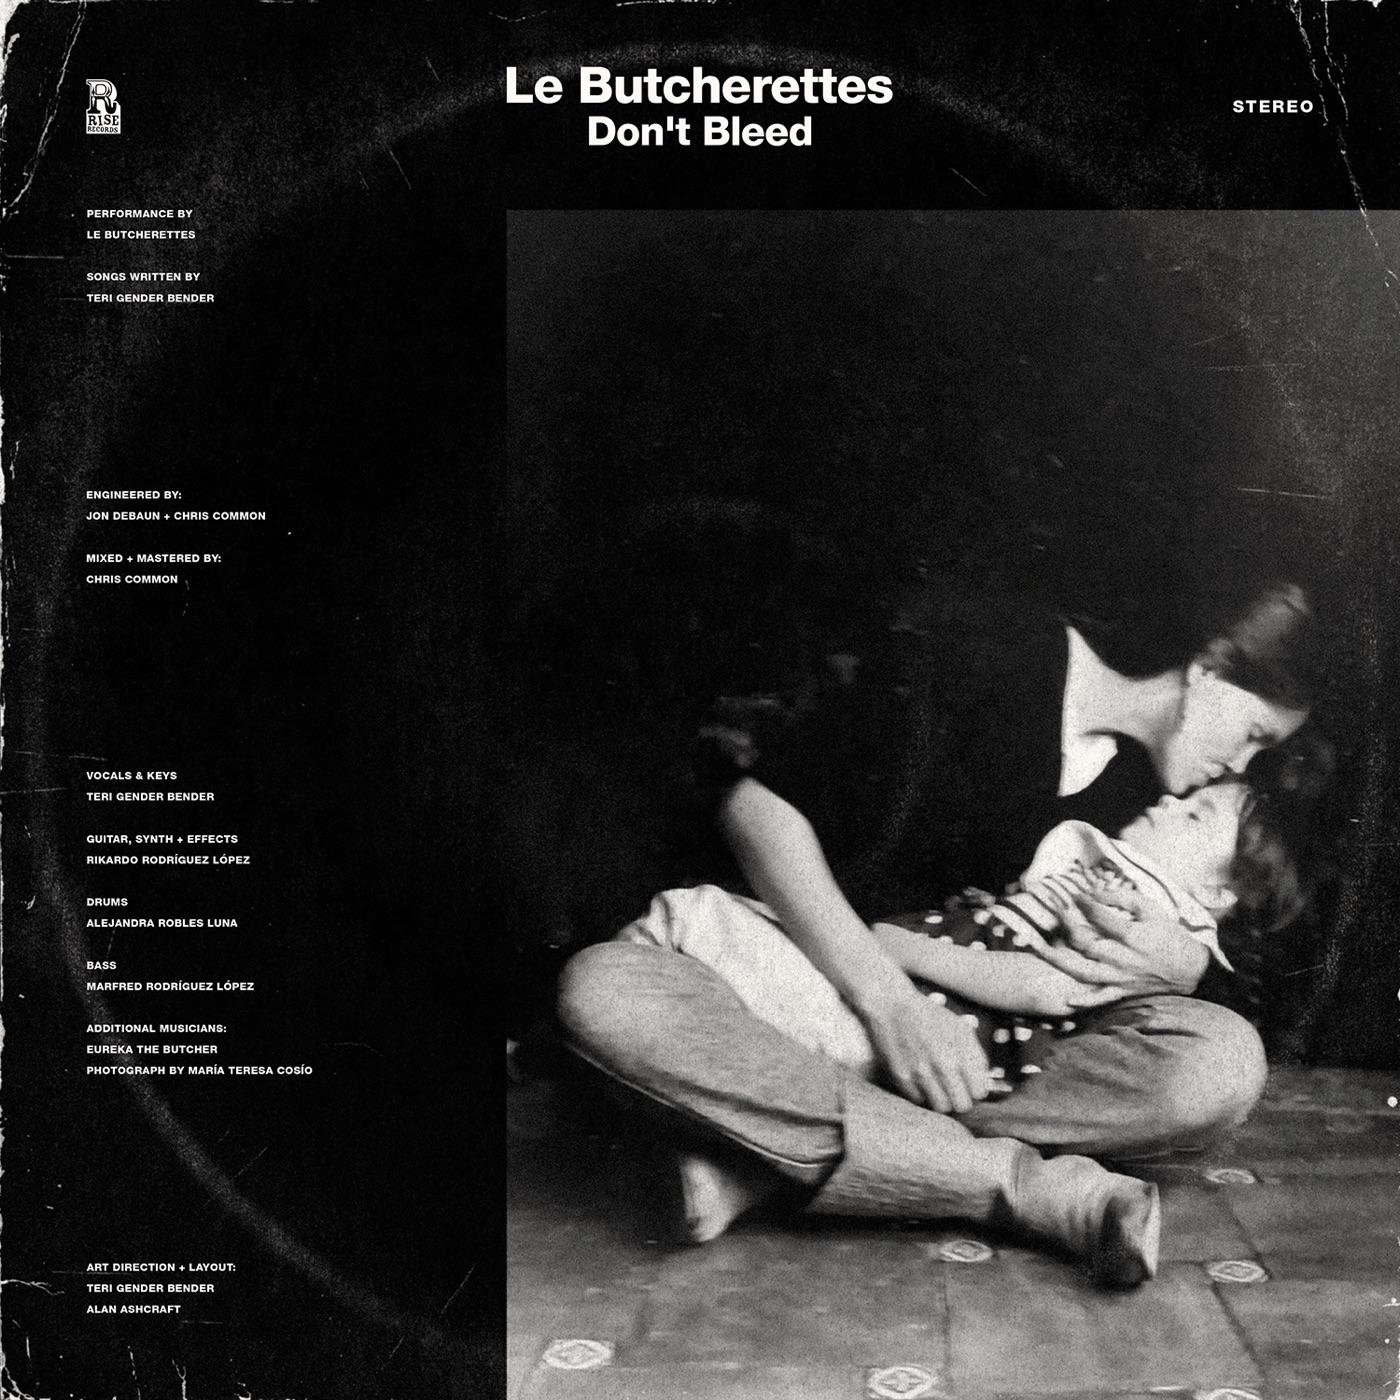 le butcherettes tunisia don't bleed ep album cover artwork